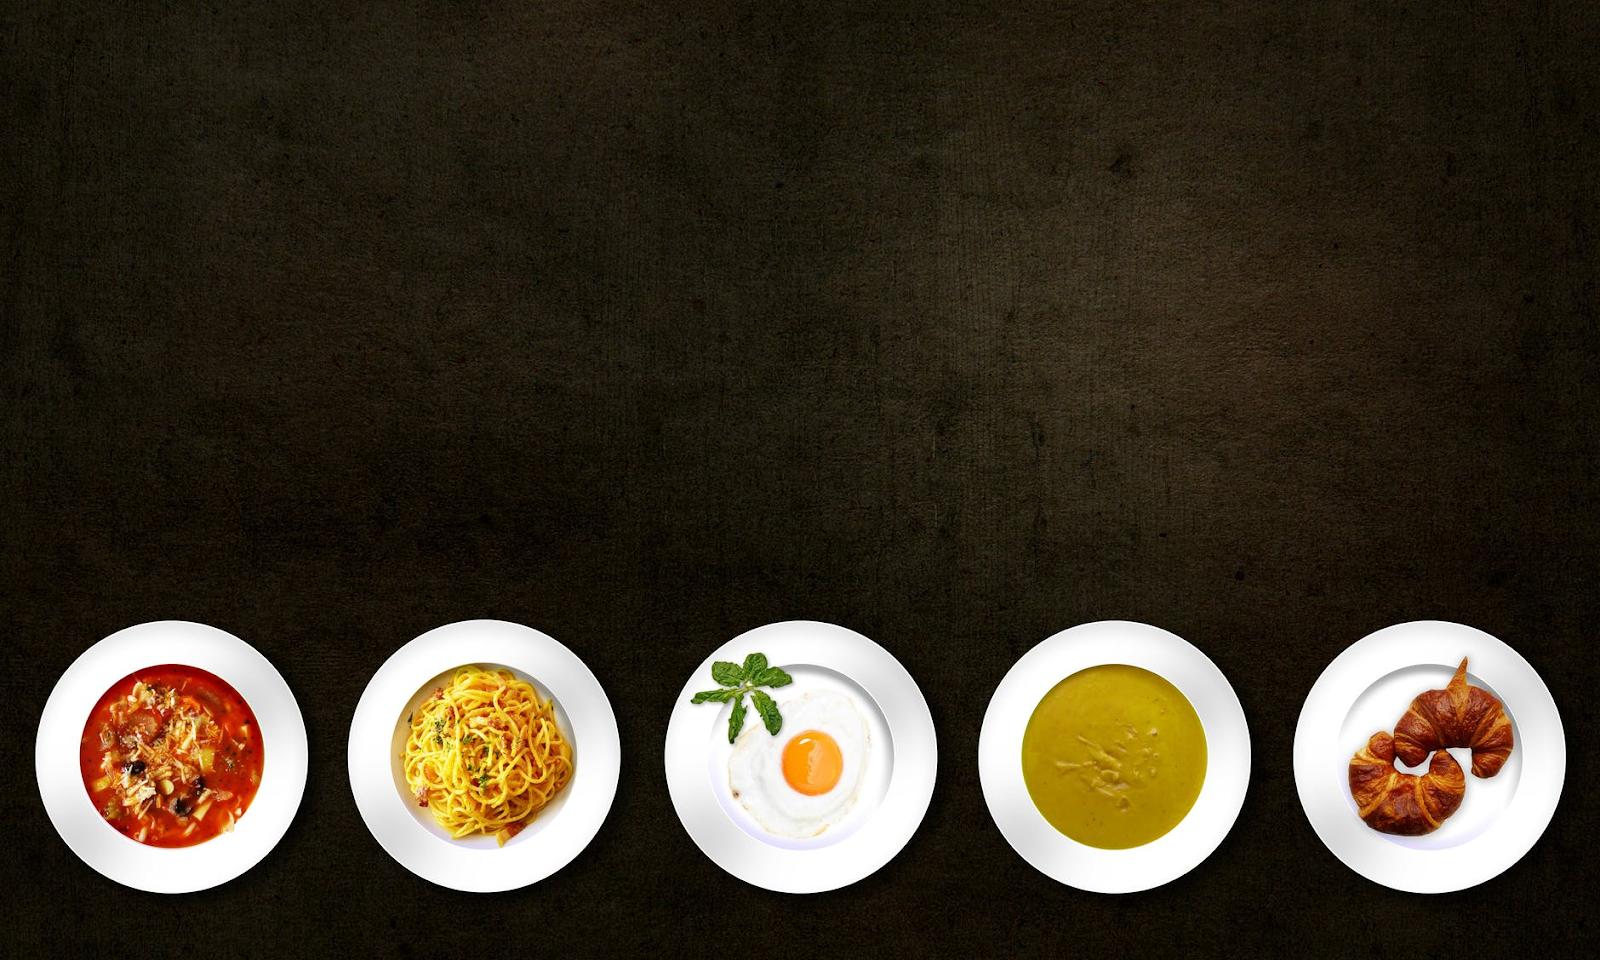 a row of dinner plates